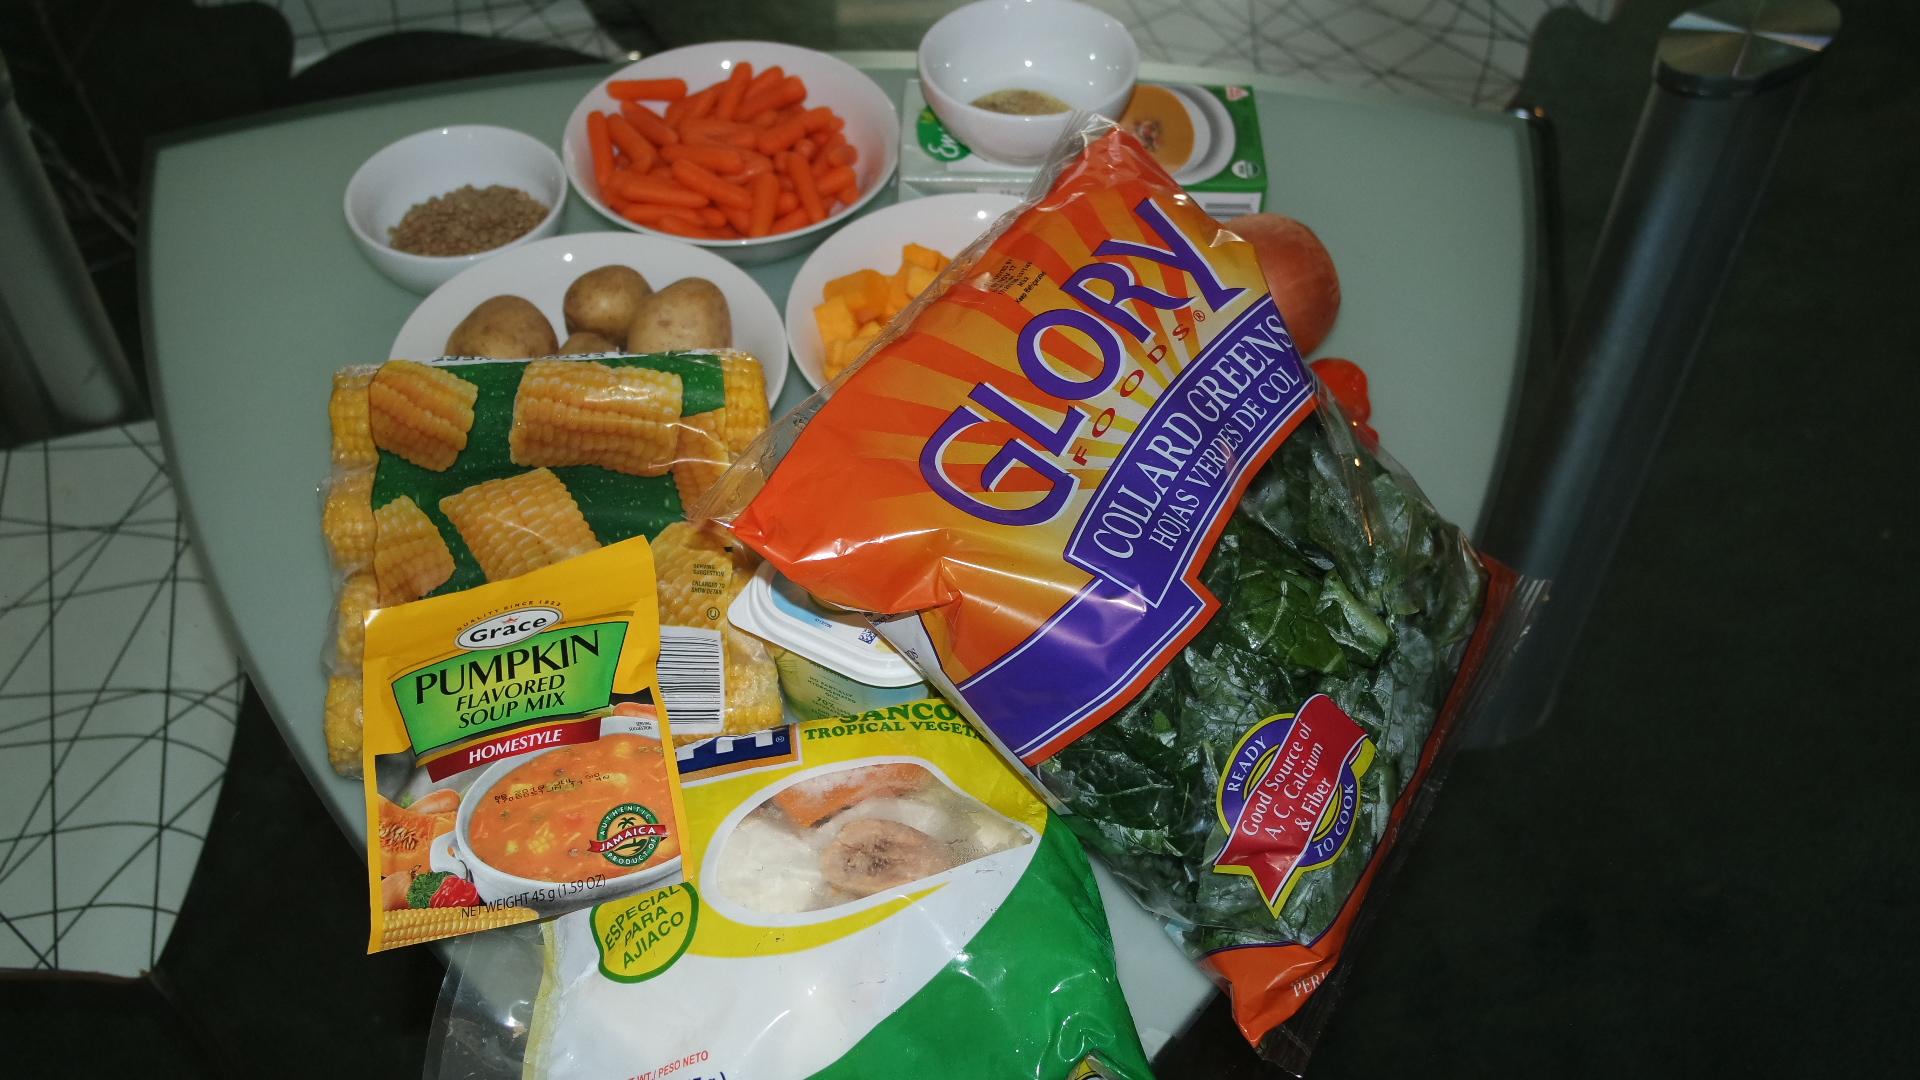 Pumpkin Flavored Veggie Soup